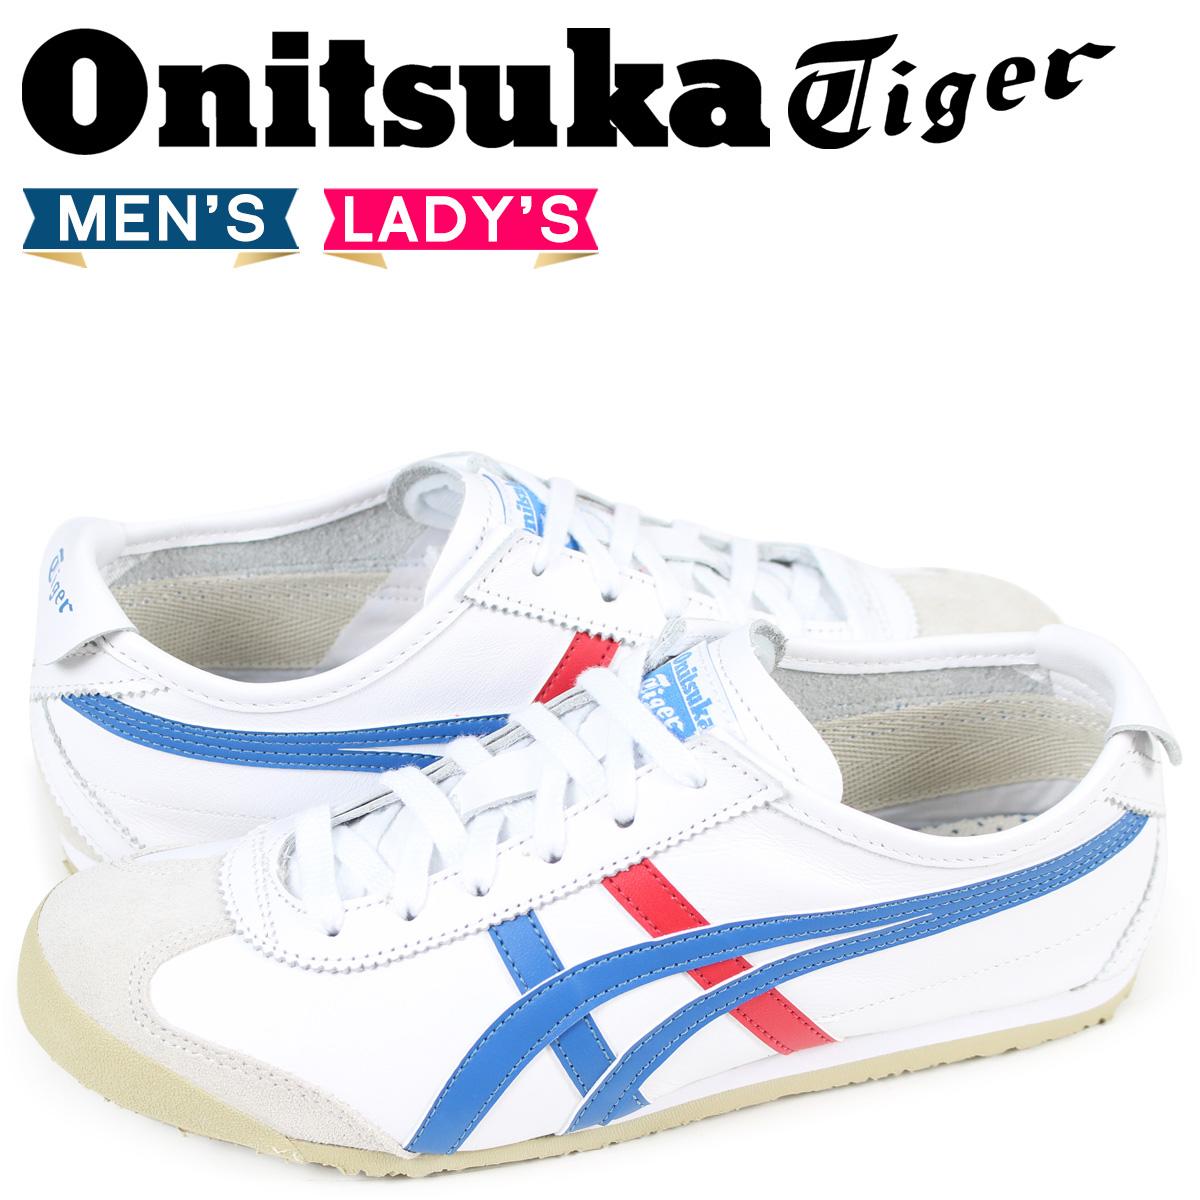 Onitsuka Tiger MEXICO 66 オニツカタイガー メキシコ 66 スニーカー メンズ レディース ホワイト 白 DL202-0146 THL202-0146 DL408-0146 [3/2 追加入荷]